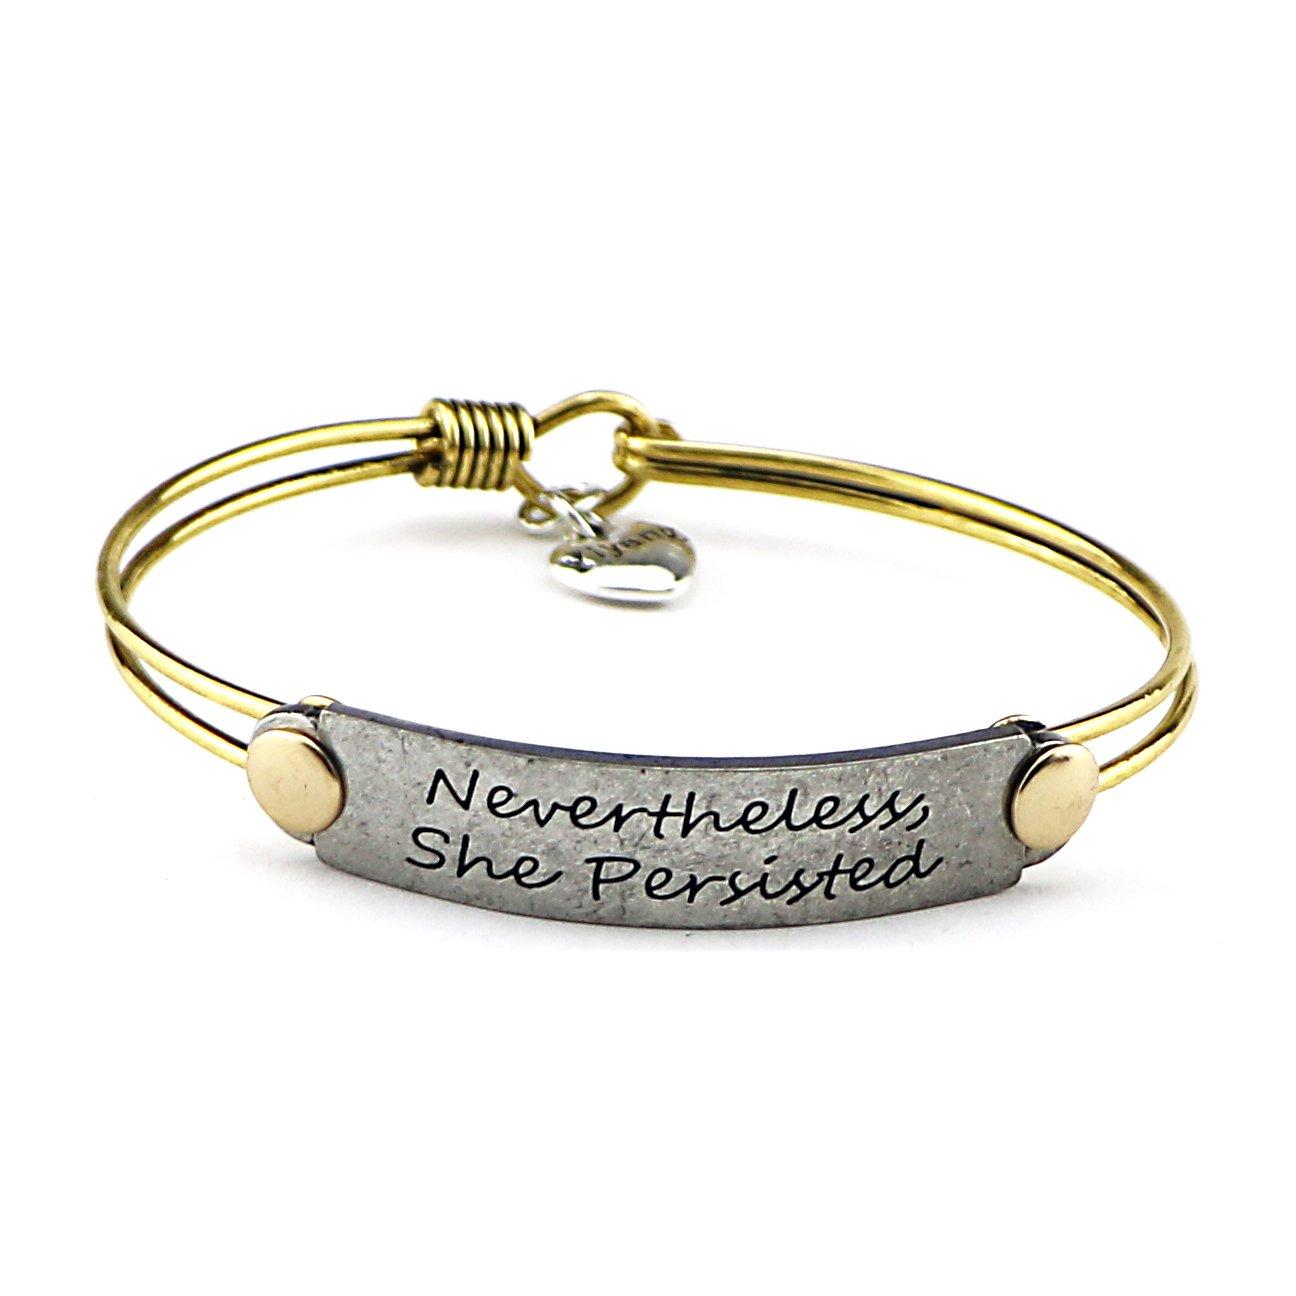 Yiyang Friendship Handmade Vintage Bangle Bracelet Inspirational Jewelry Gift Handmade Jewellery (Nevertheless she persisted)